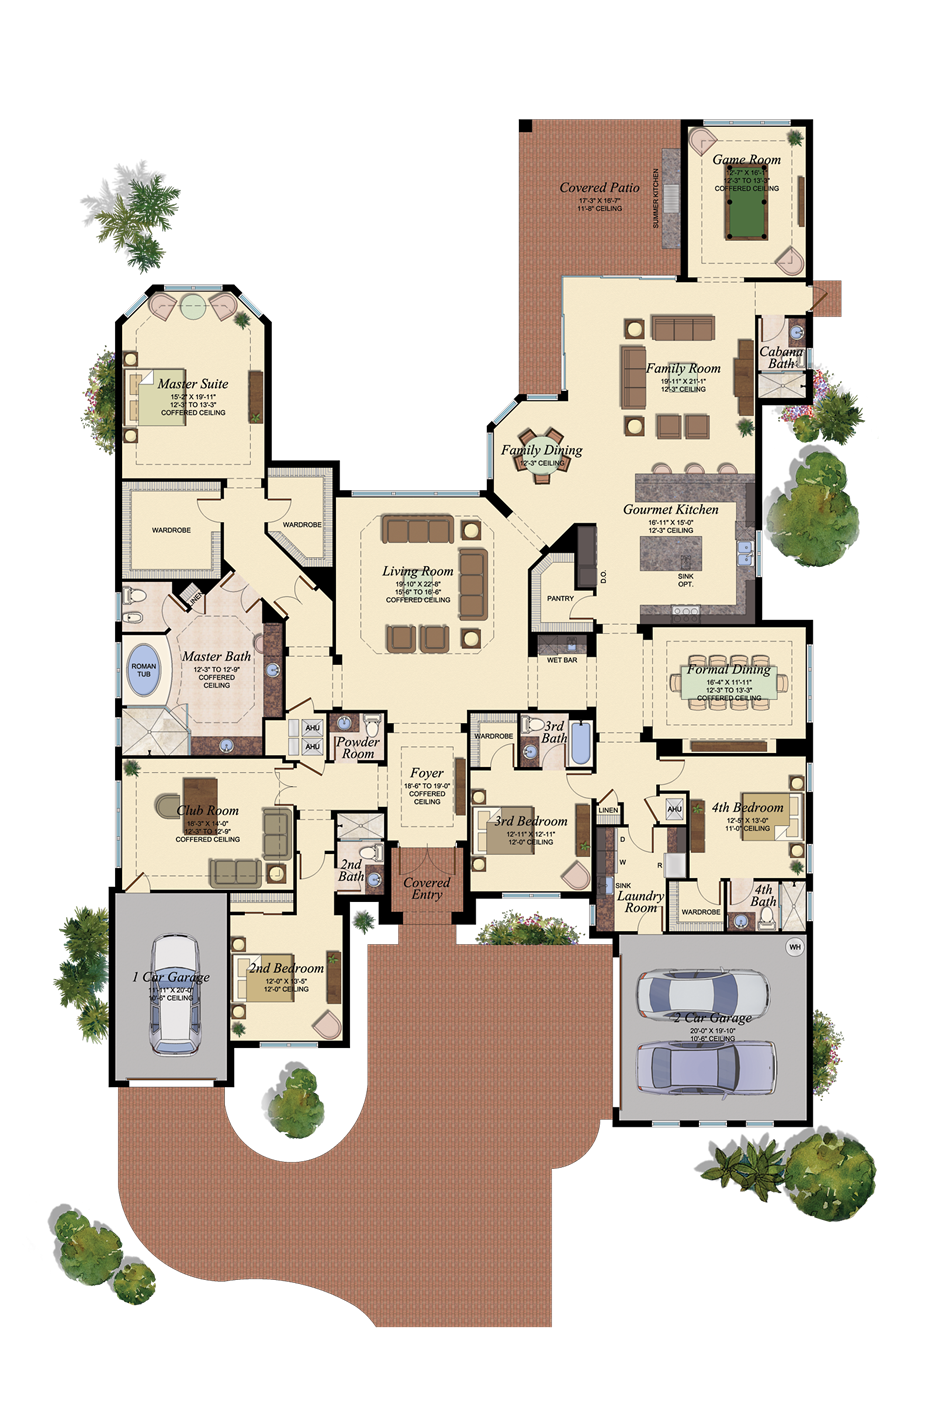 Floorplan Dream House Plans Floor Plans House Layouts